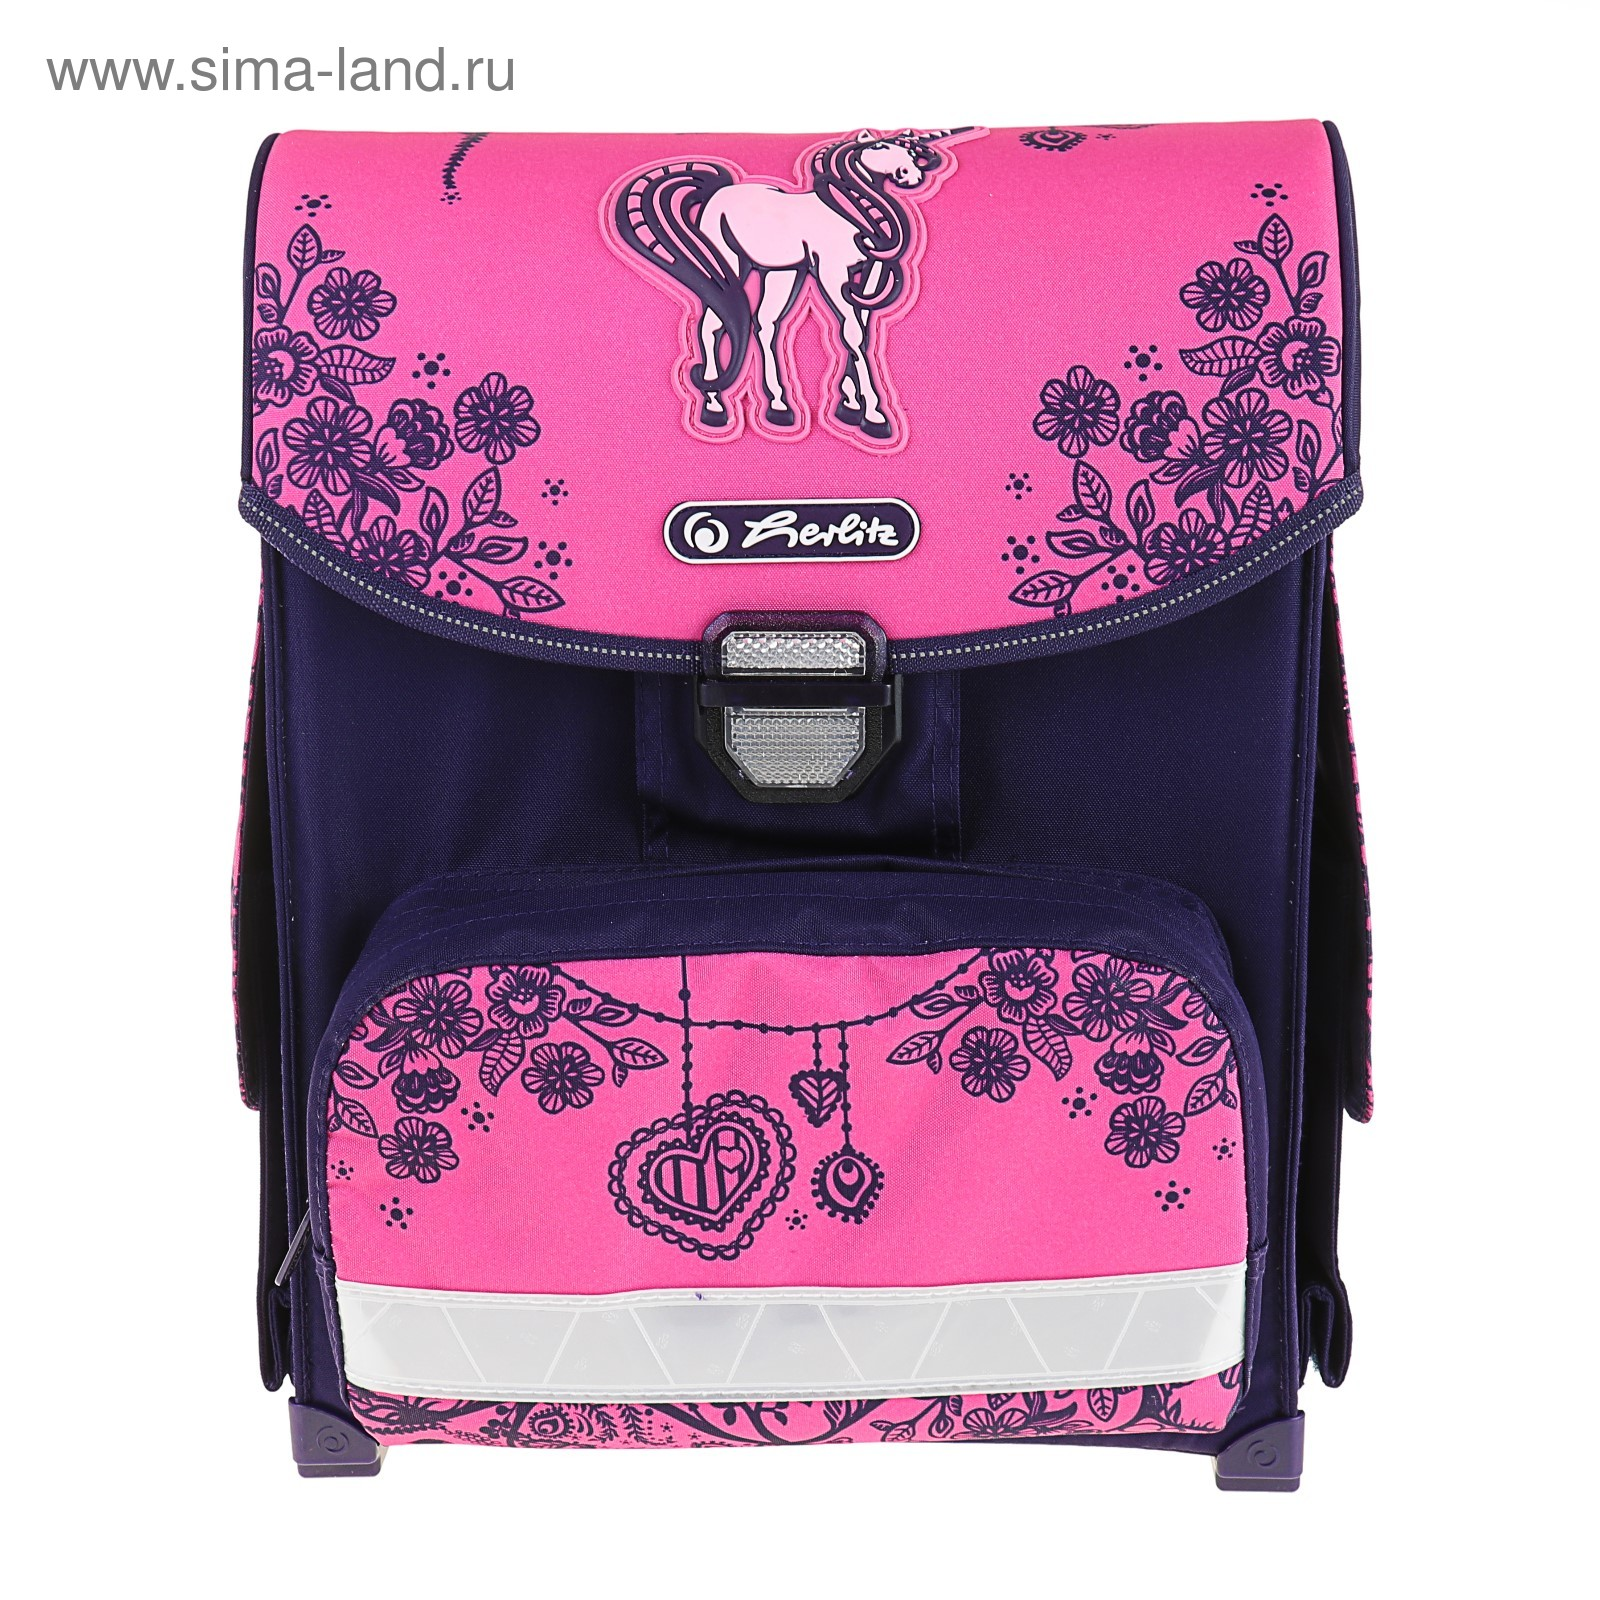 8c4a4688b611 Ранец на замке Herlirz SMART 38х30х21см, для девочки, Unicorn Day,  розовый/фиолетовый